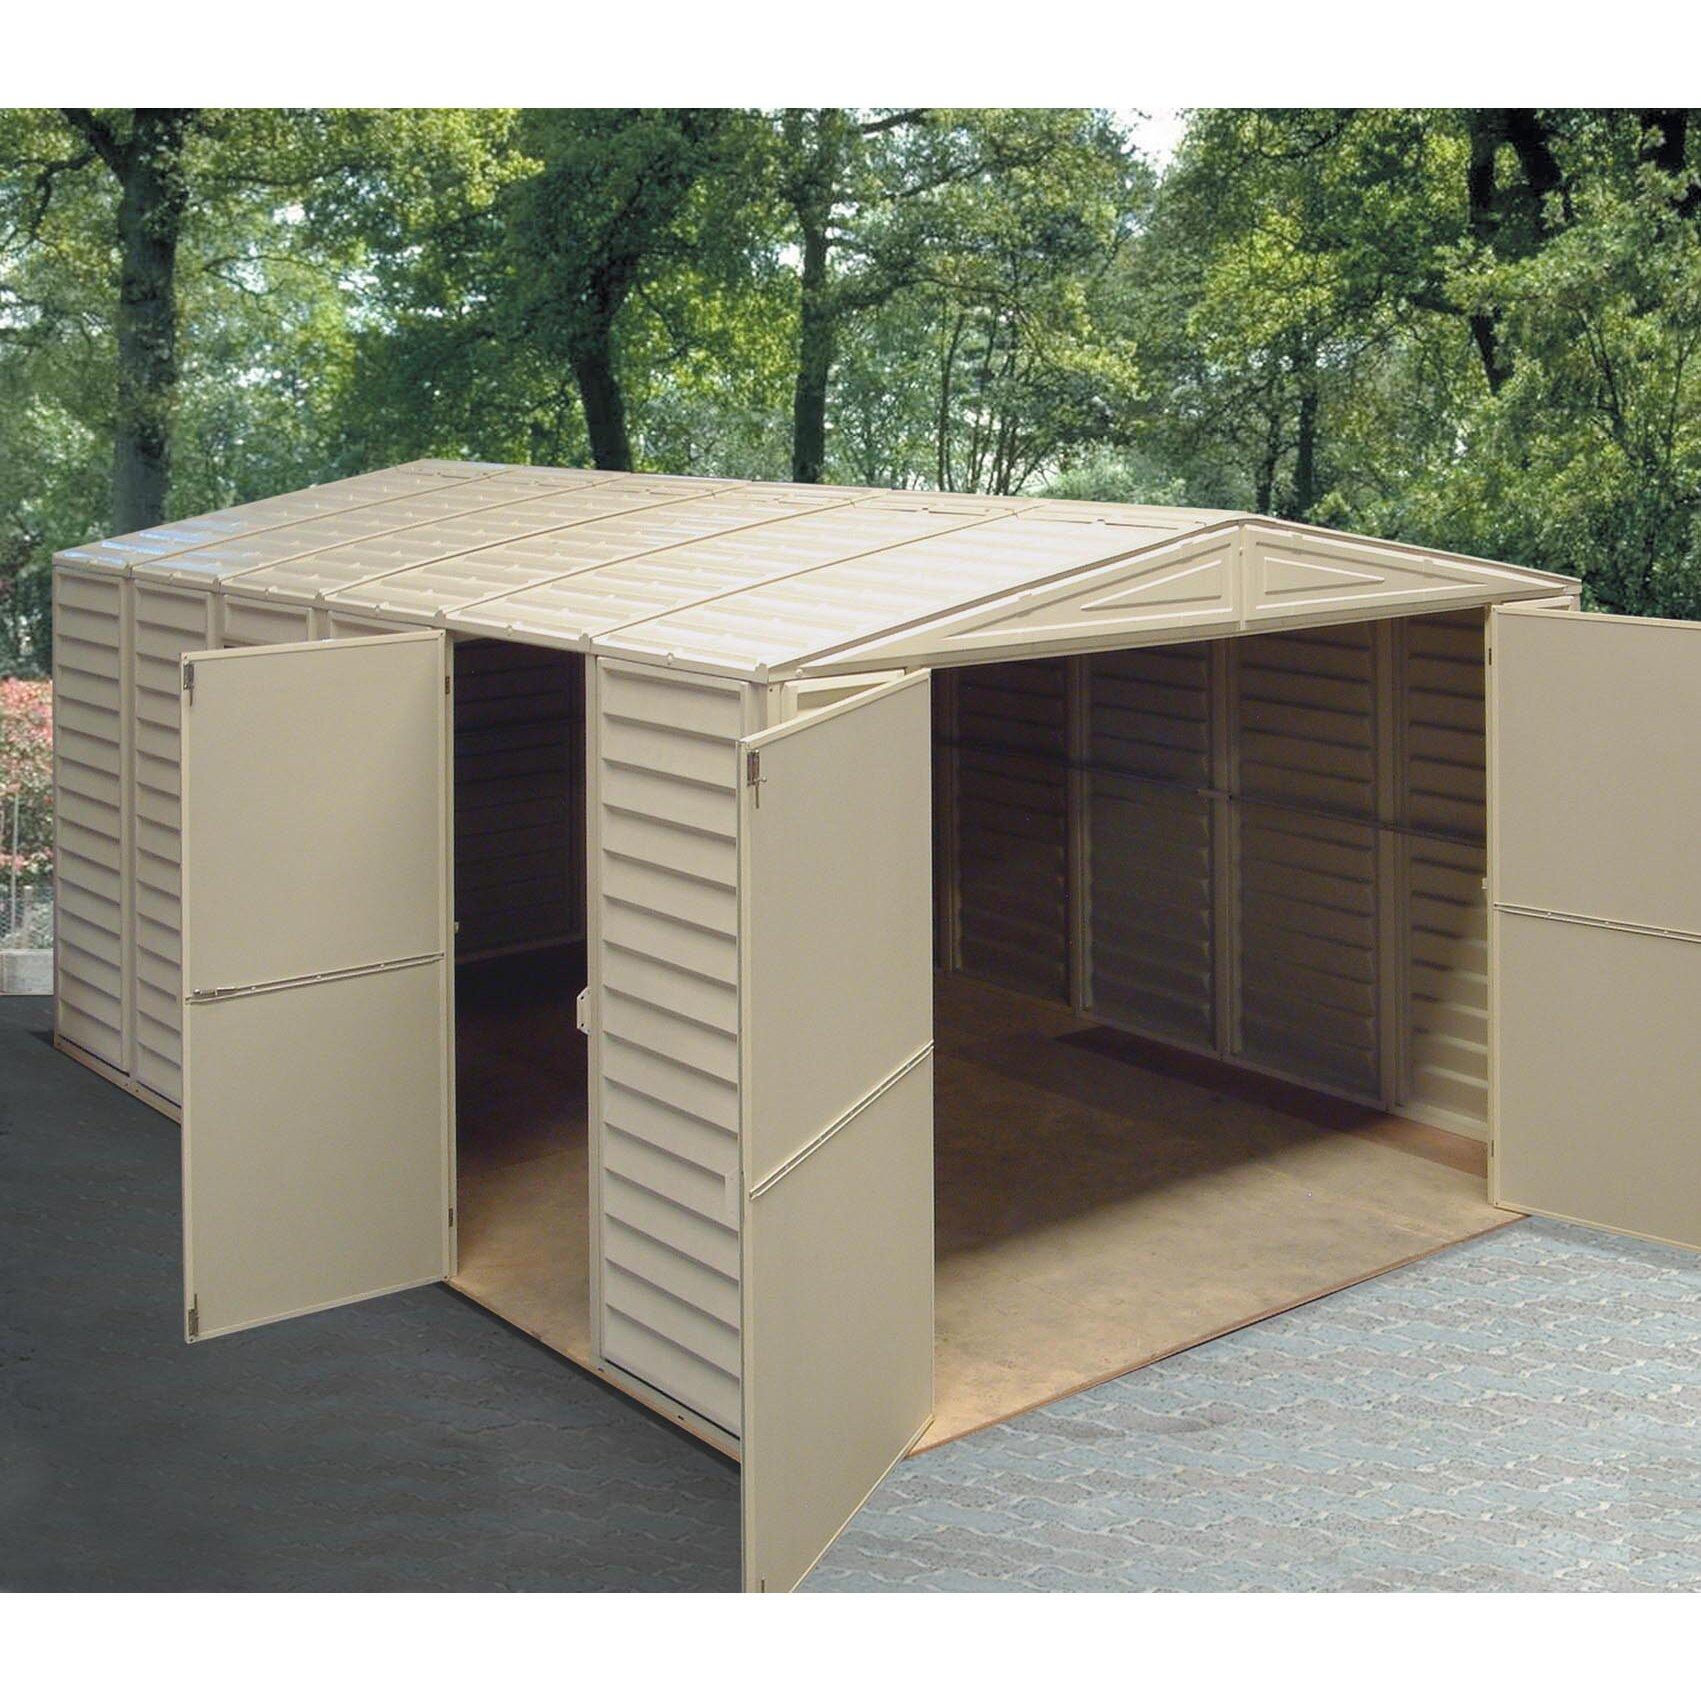 Vinyl Sheds Product : Duramax vinyl garage shed reviews wayfair